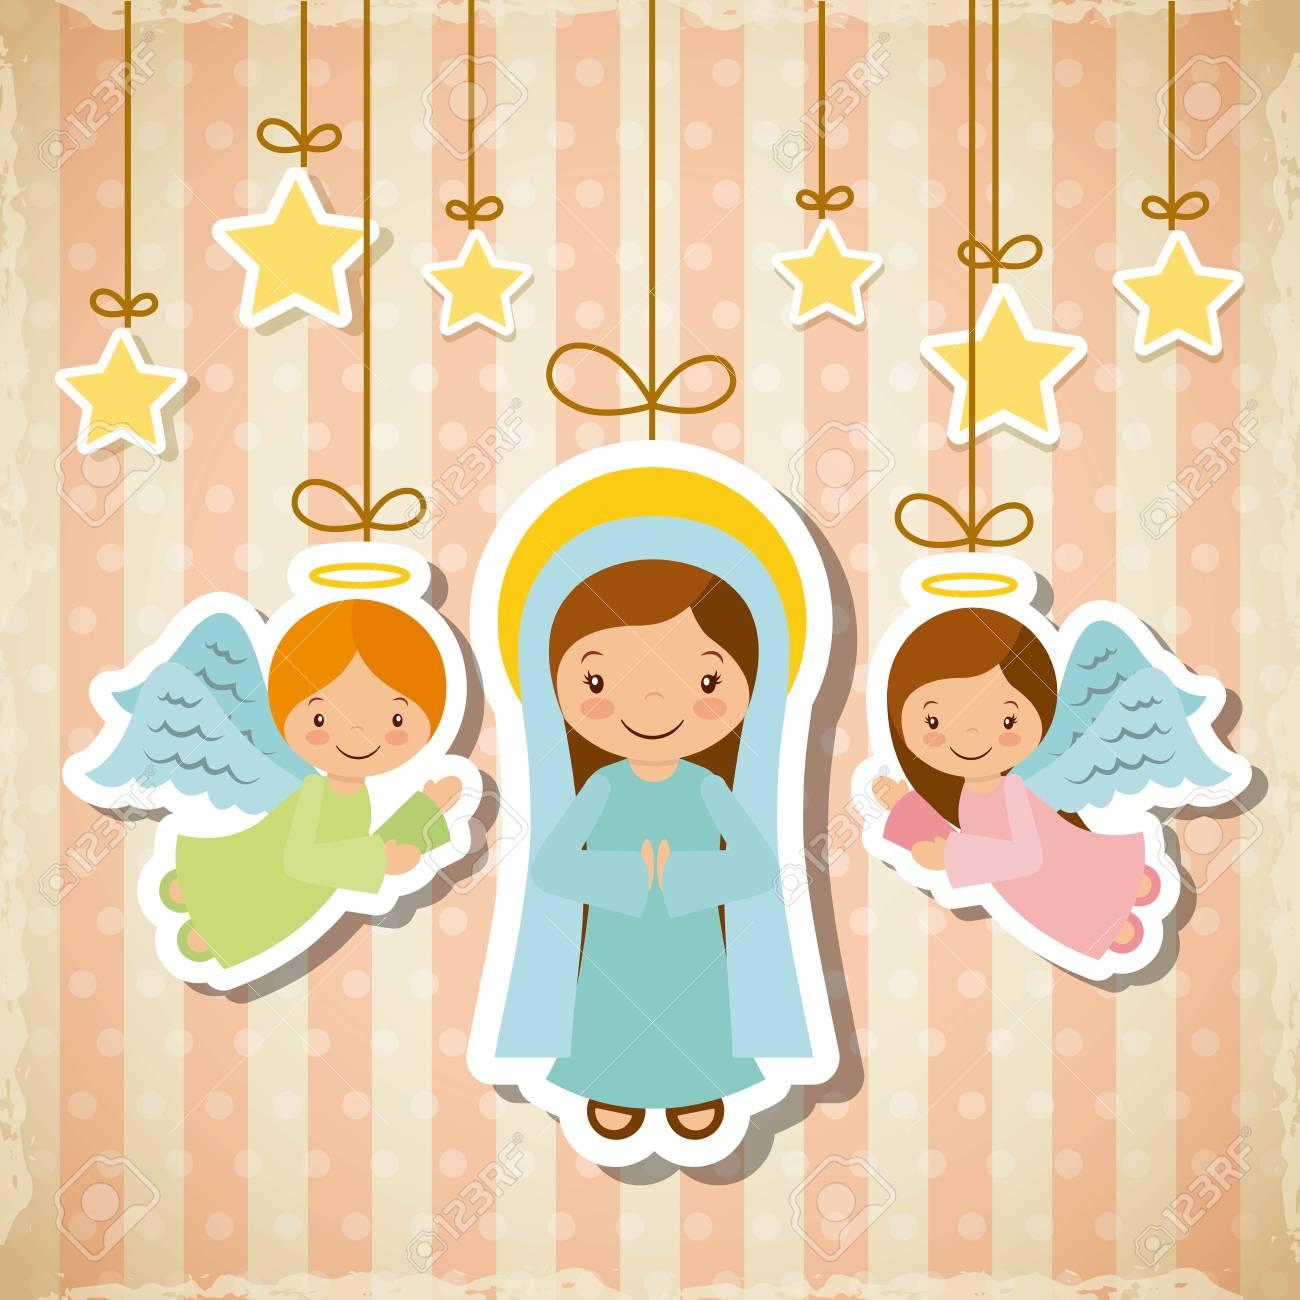 jungfrau maria designs